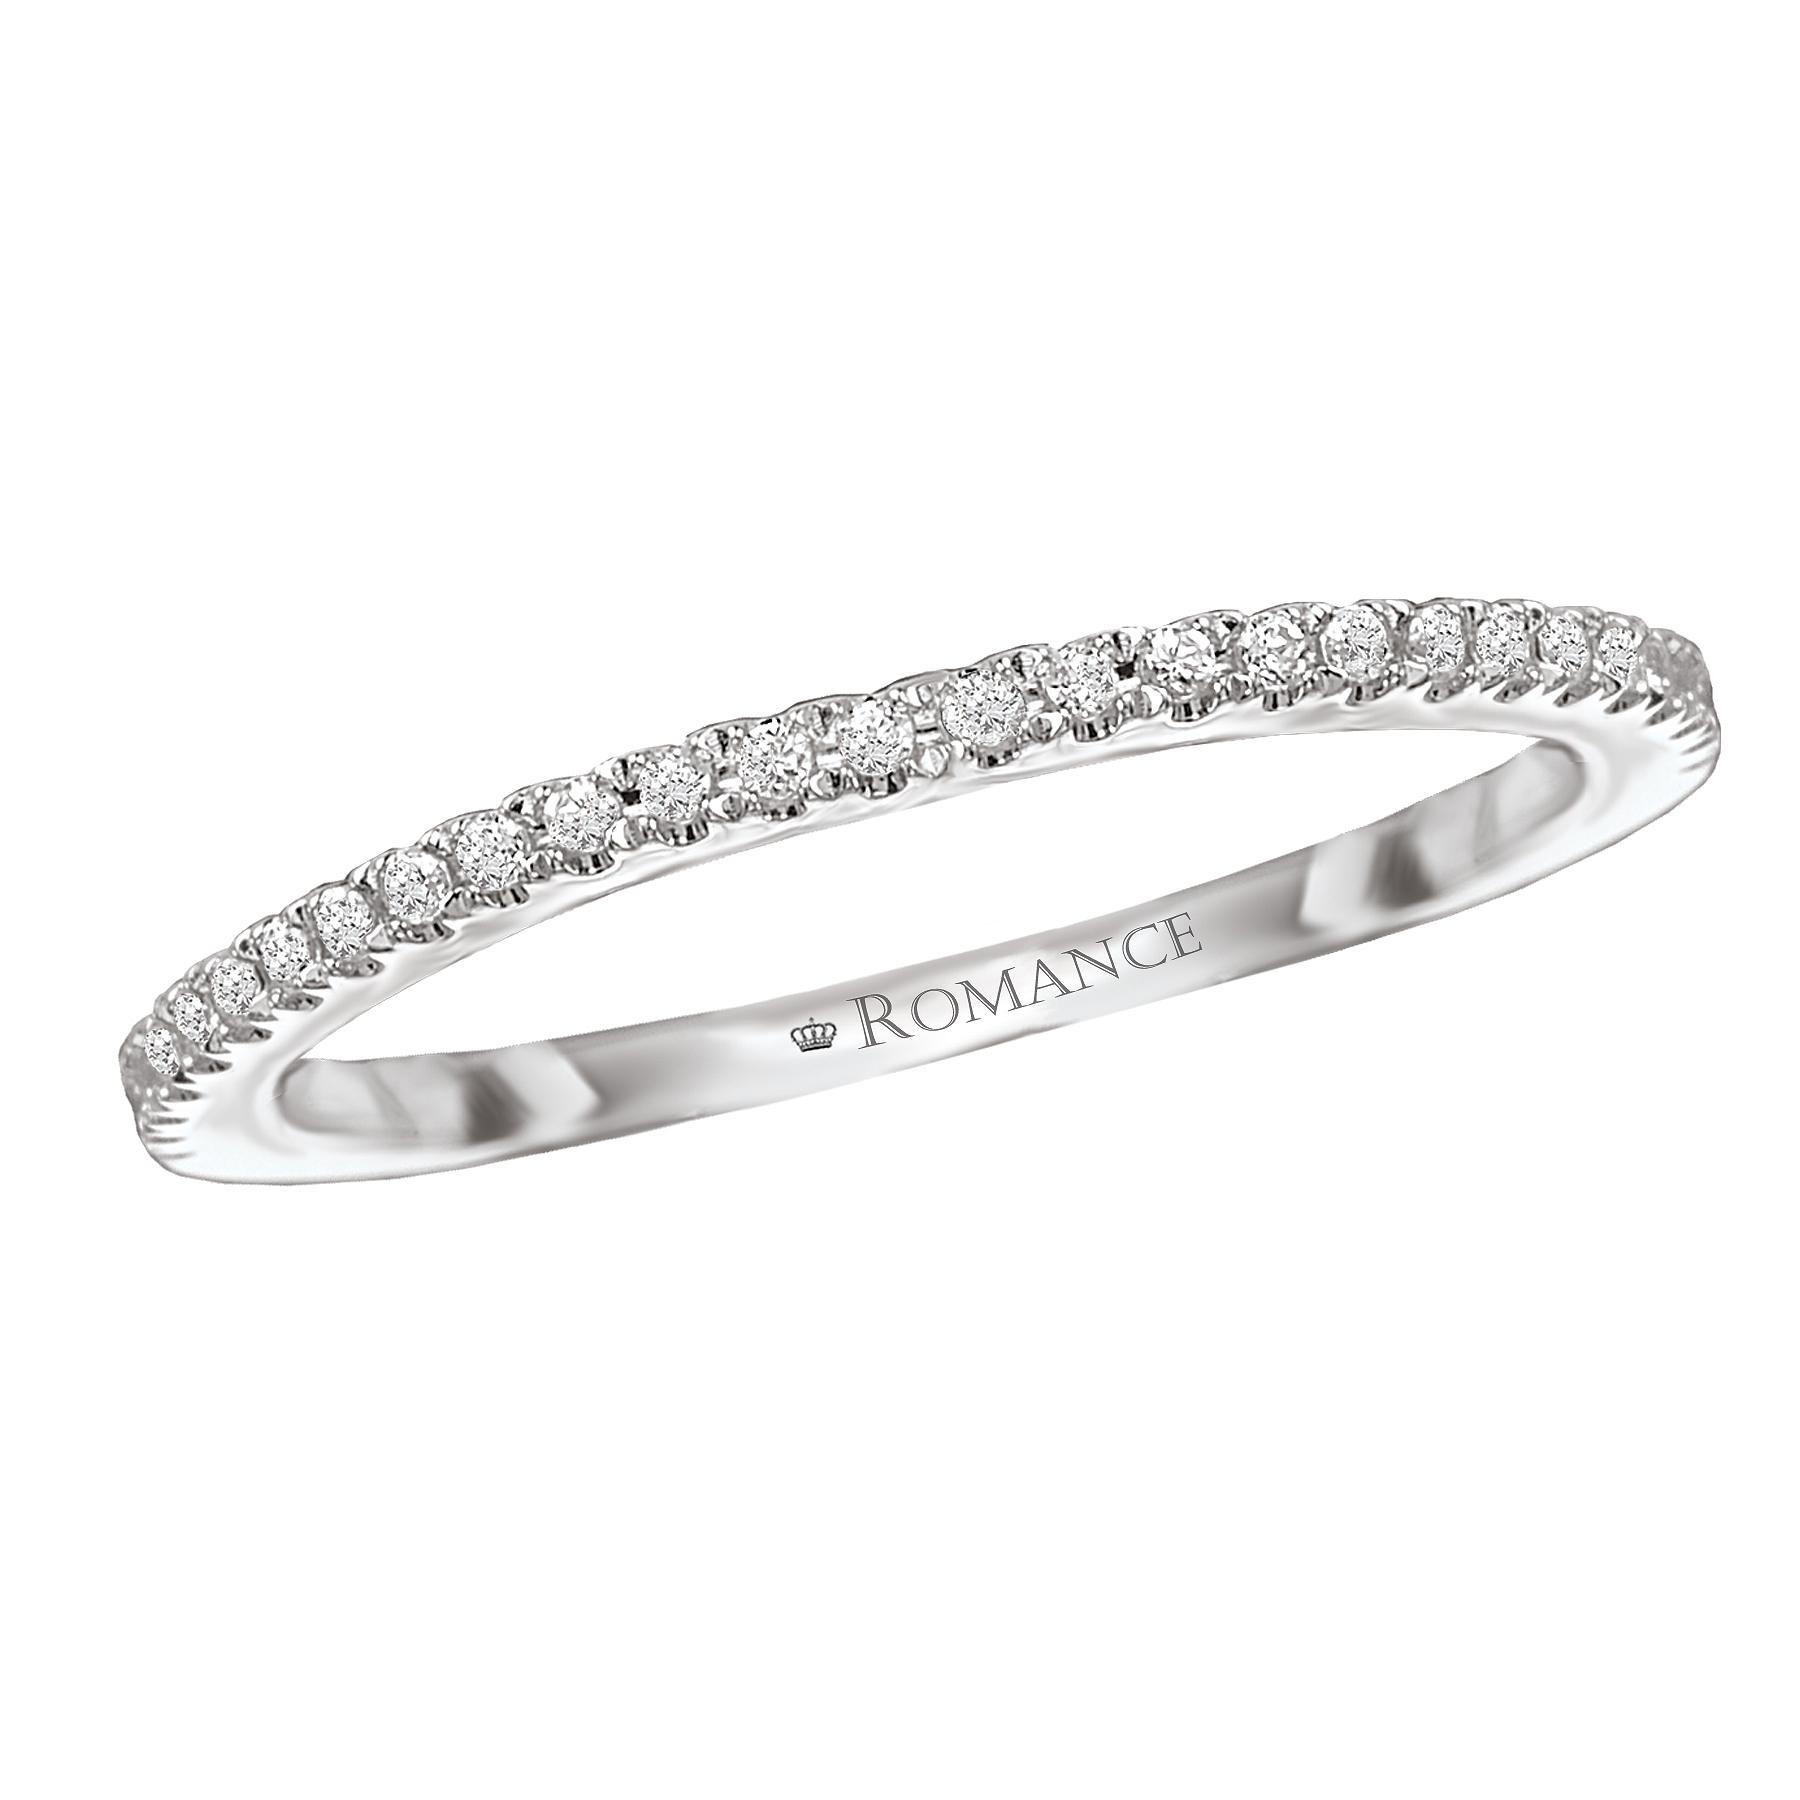 Romance Wedding Bands 118115-W product image